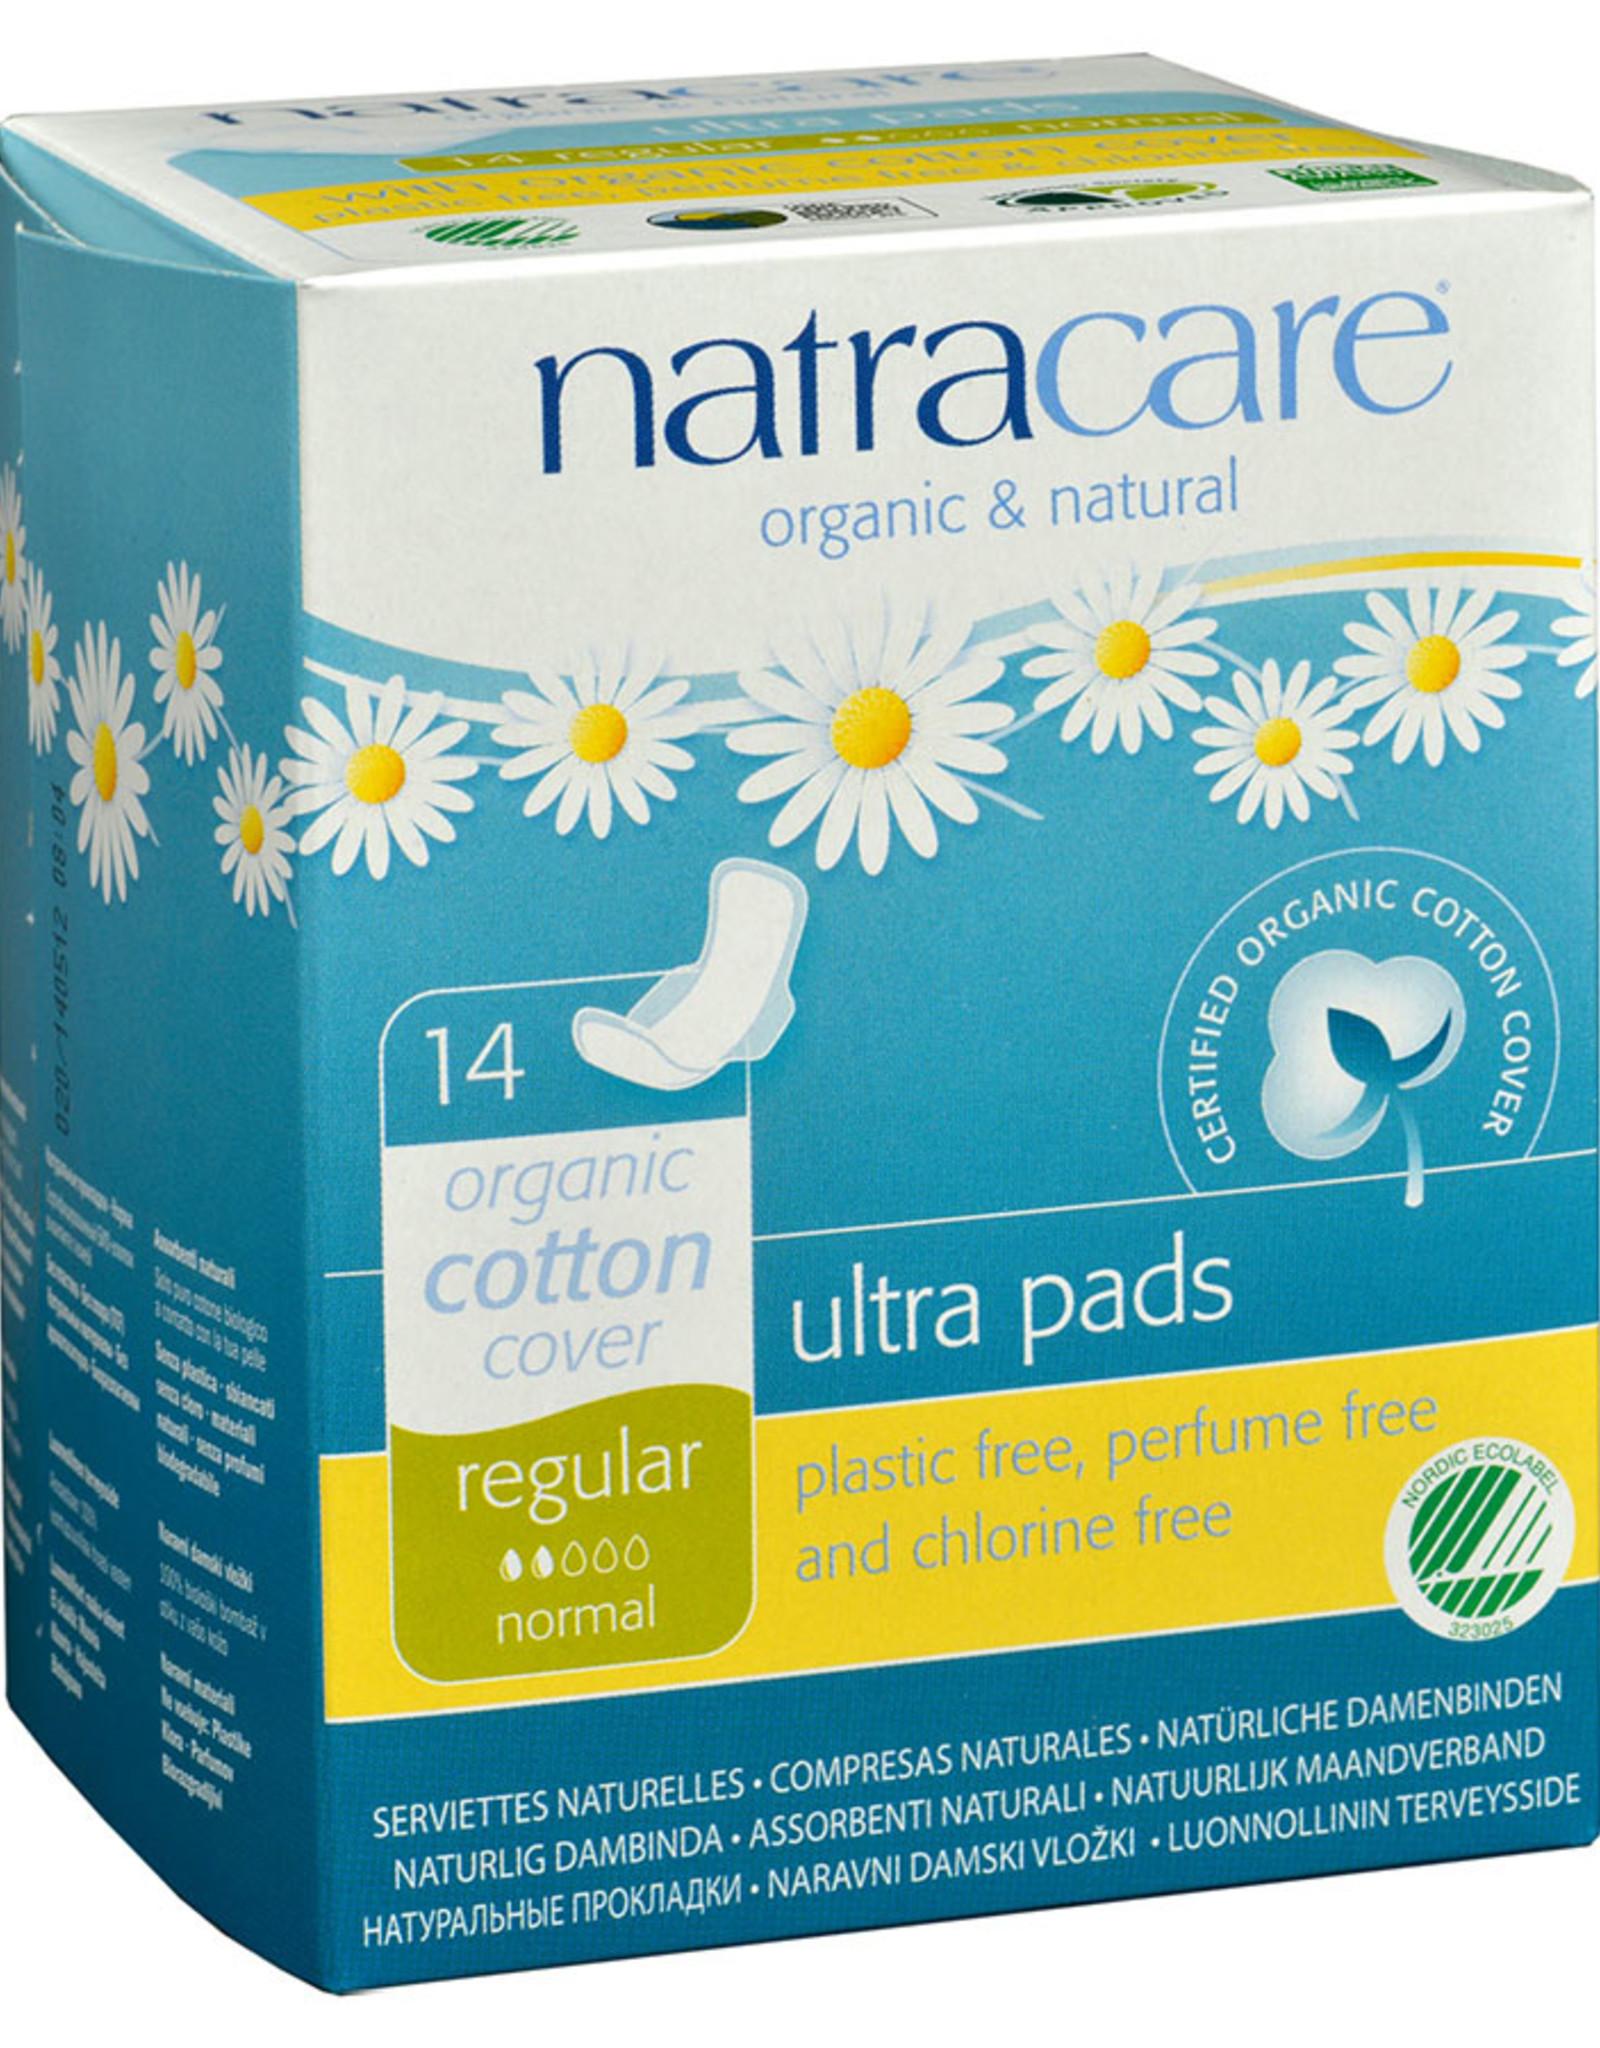 Natracare Natracare Ultra Pads